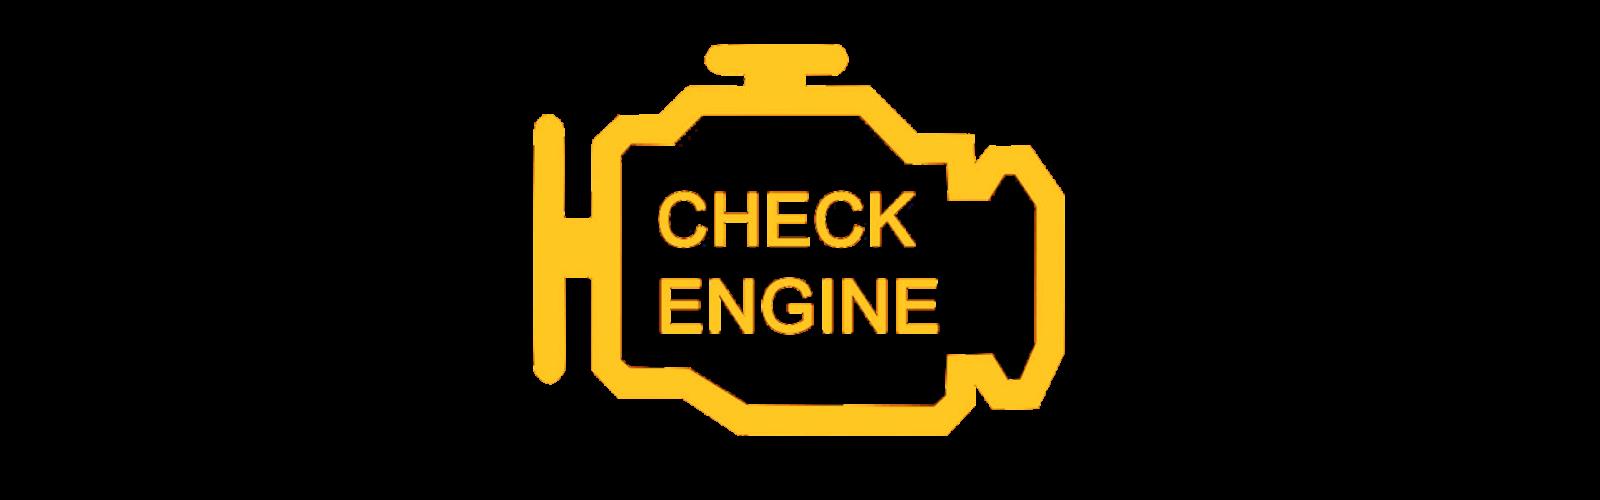 Diagnostic services universal repair. Engine clipart check engine light